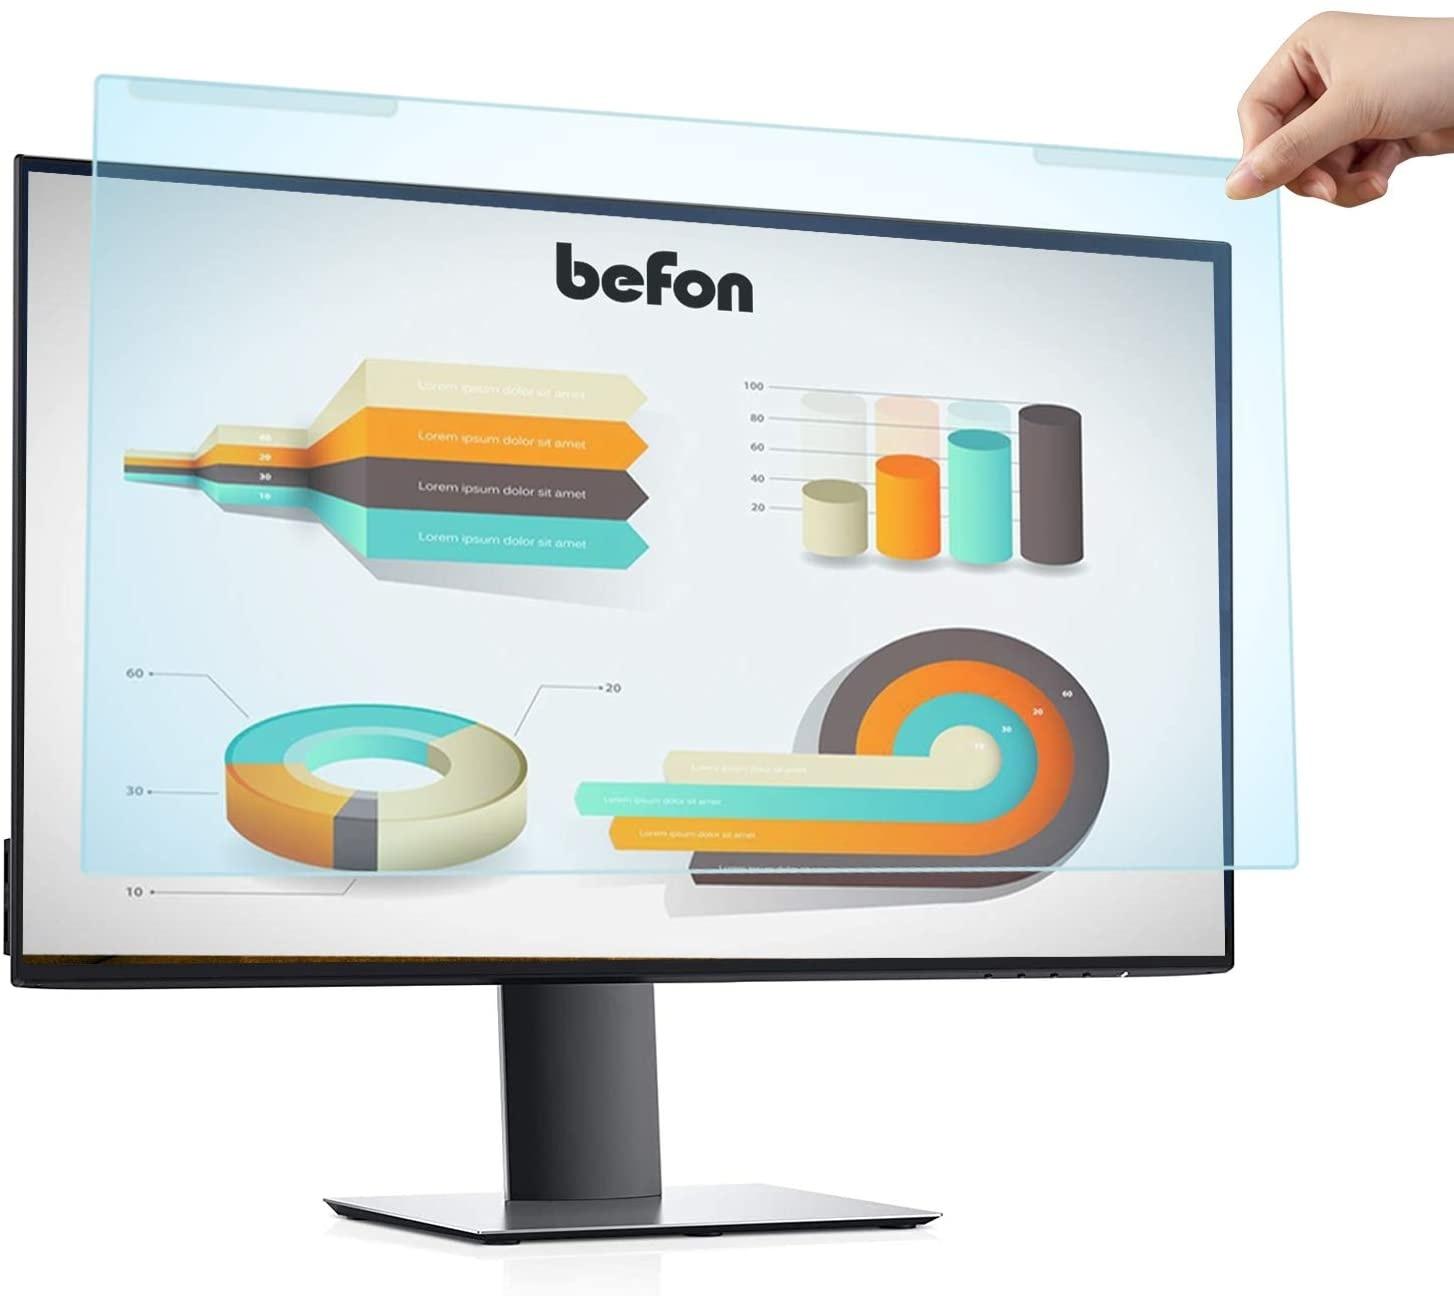 Befon 32 بوصة مكافحة الأزرق مرشح ضوء ، مكافحة حامي ل جهاز كمبيوتر شخصي ، حماية عينيك من الضوء الأزرق الضرر 714 مللي متر x 435 مللي متر